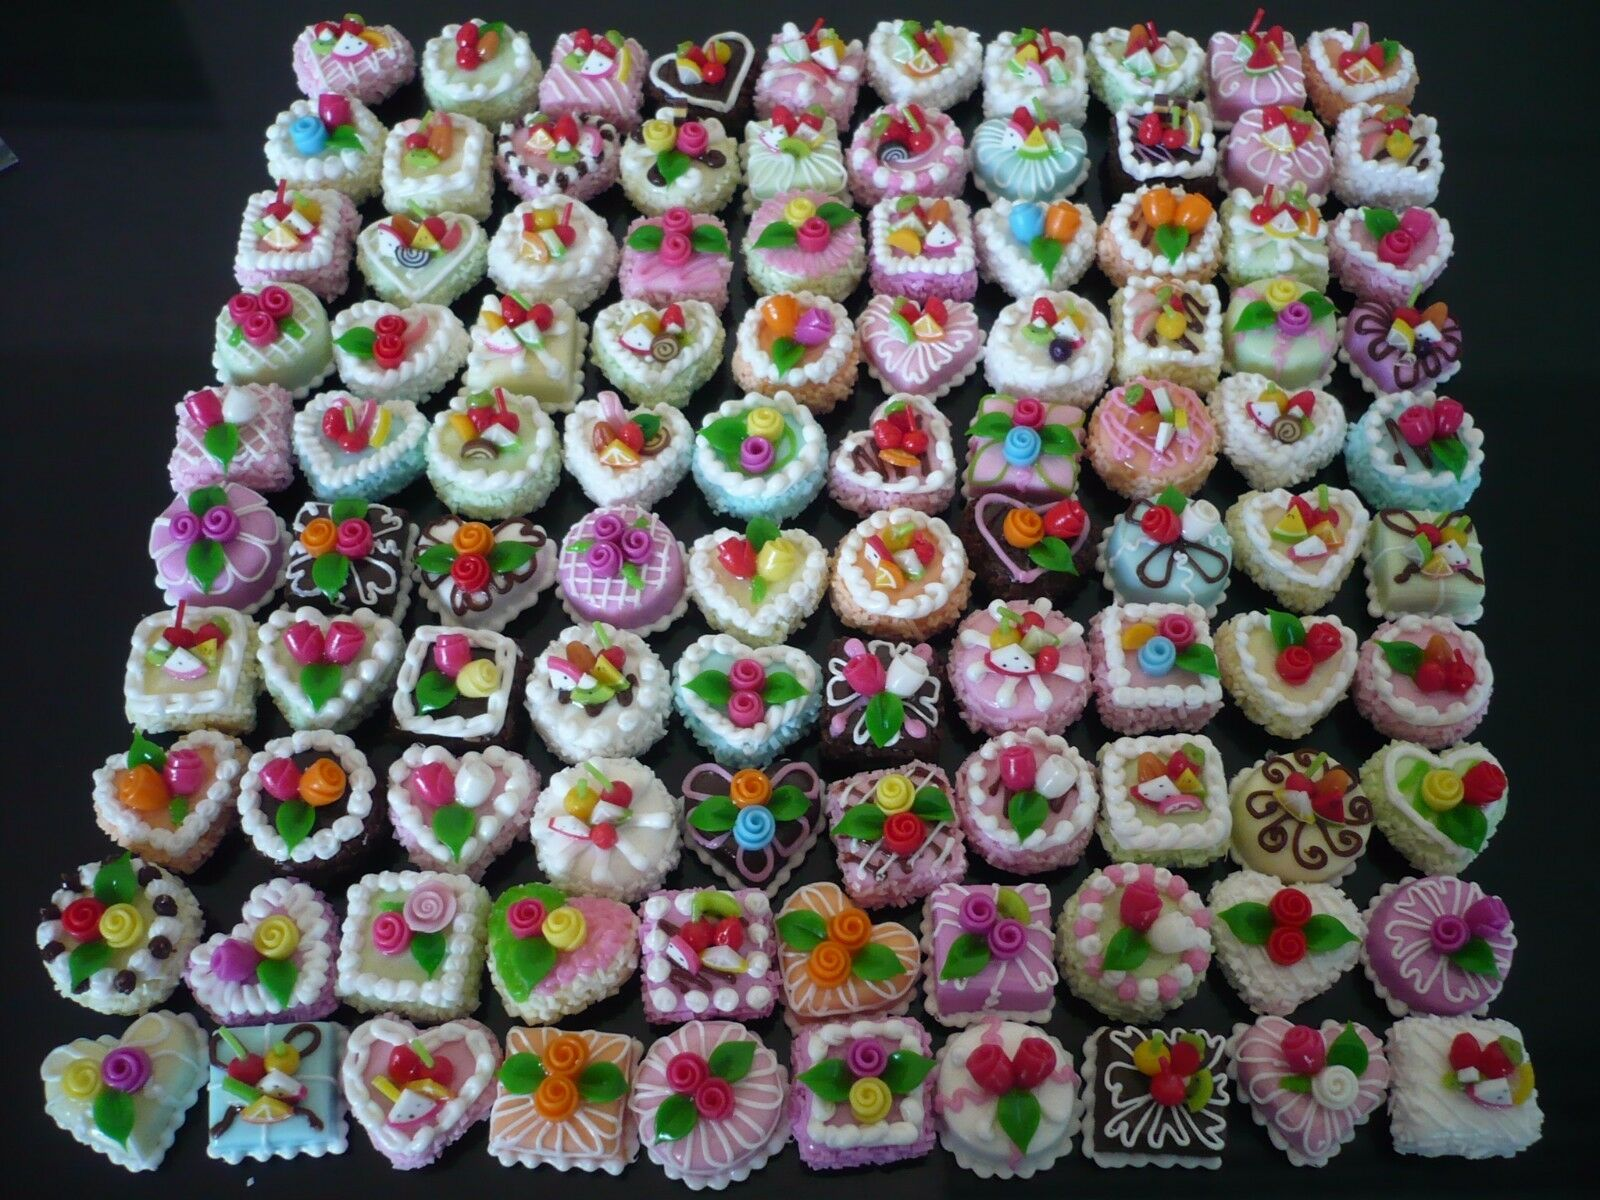 100 Mini Cakes Handmade Dollhouse Miniatures Food Supply Deco-2